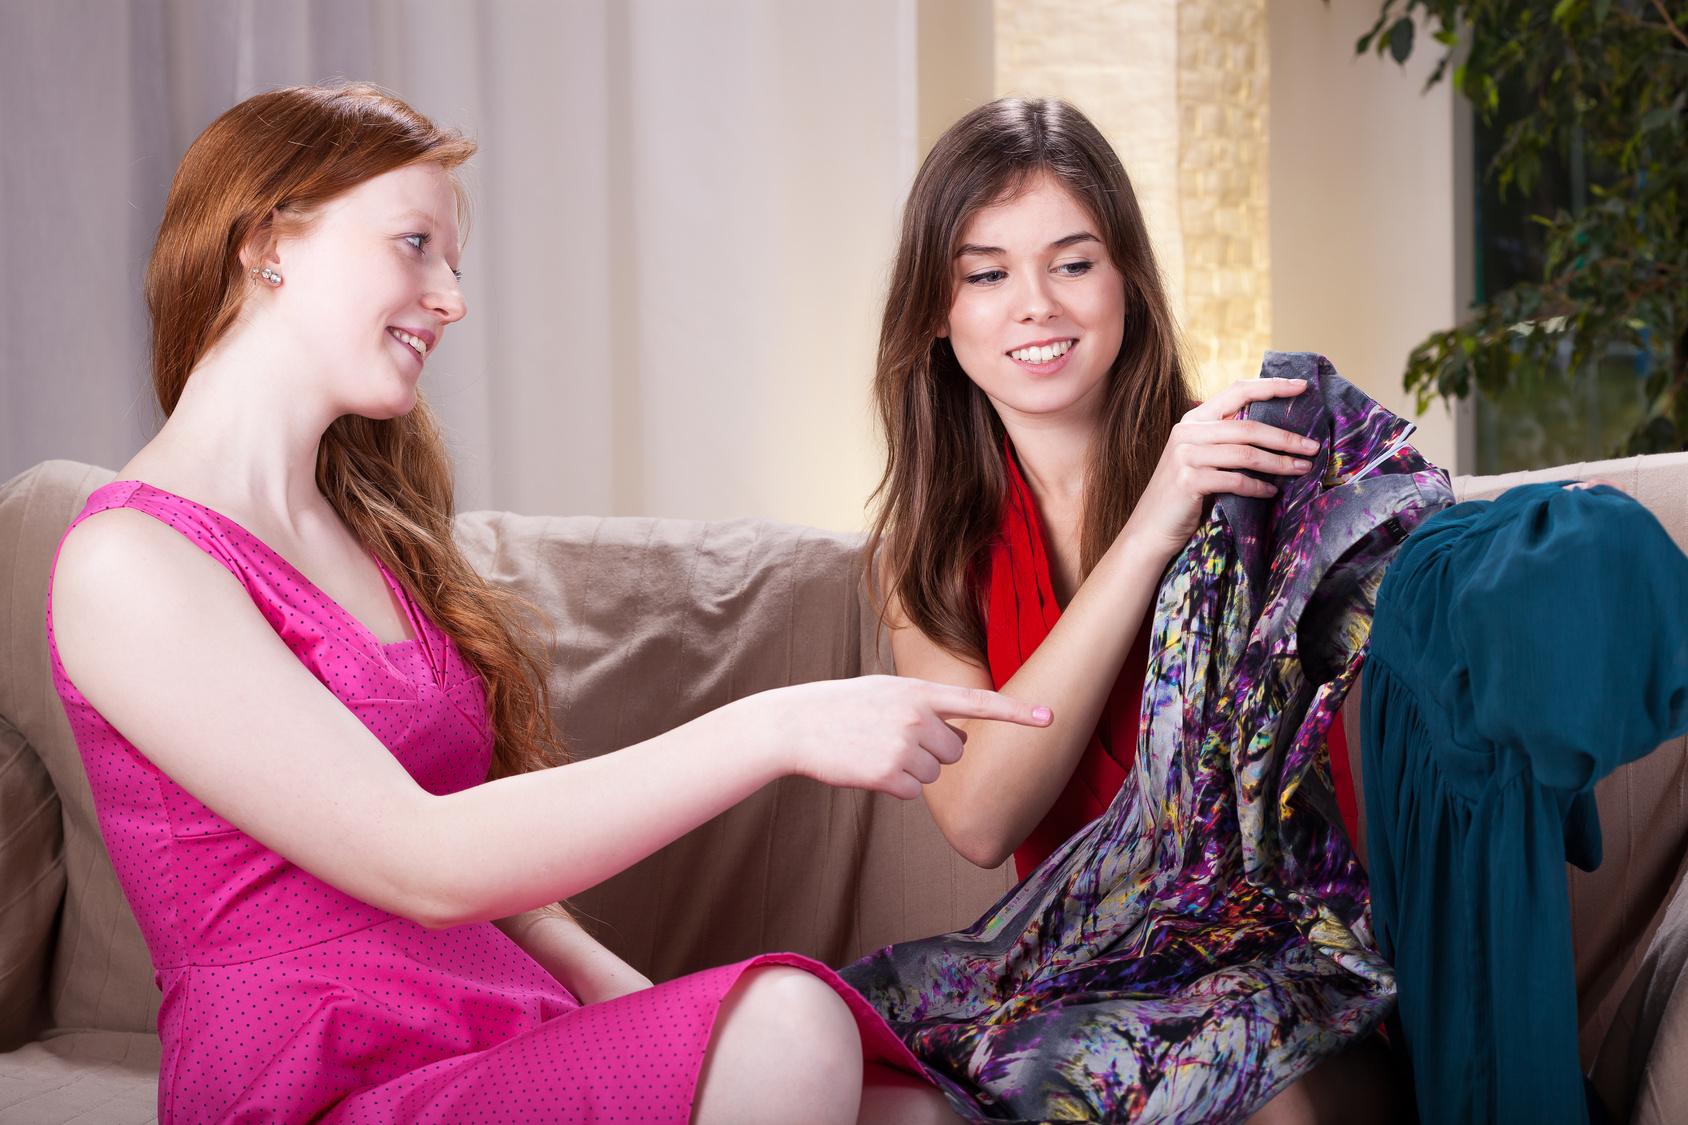 Choisir sa robe de soirée